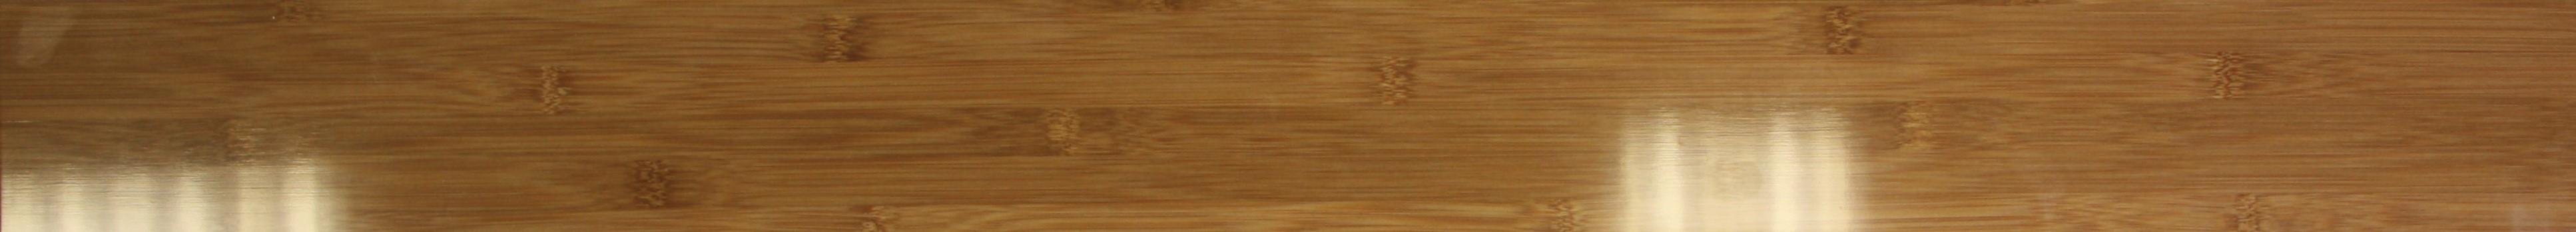 Массивная доска Bamboo Flooring Бамбук Глянец 4.7